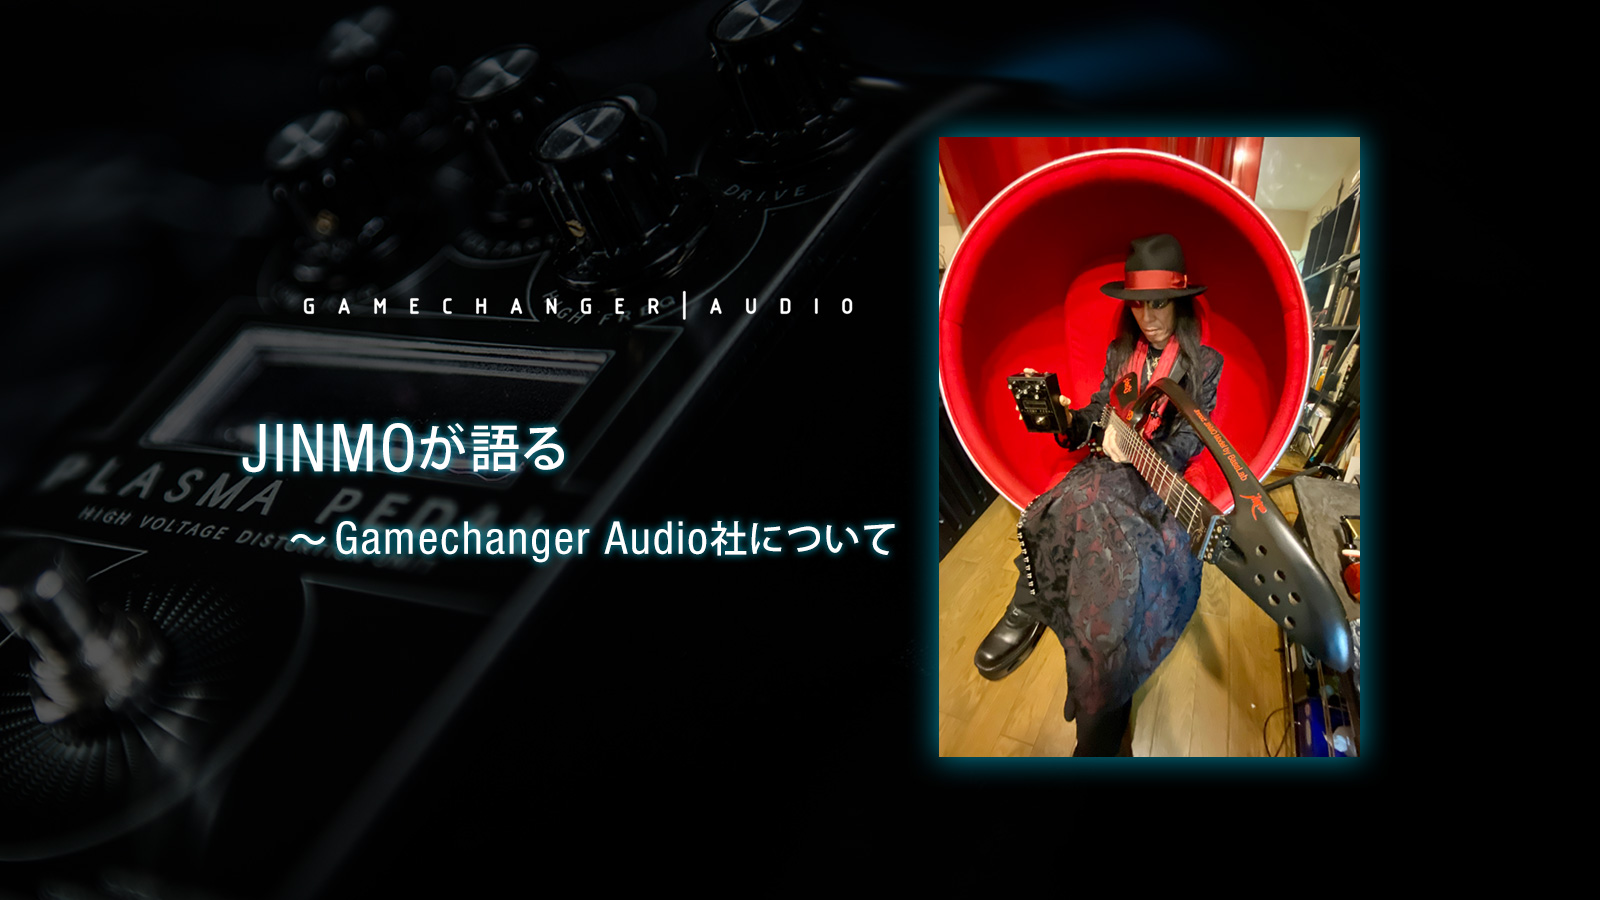 JINMOが語る〜Gamechanger Audio社について